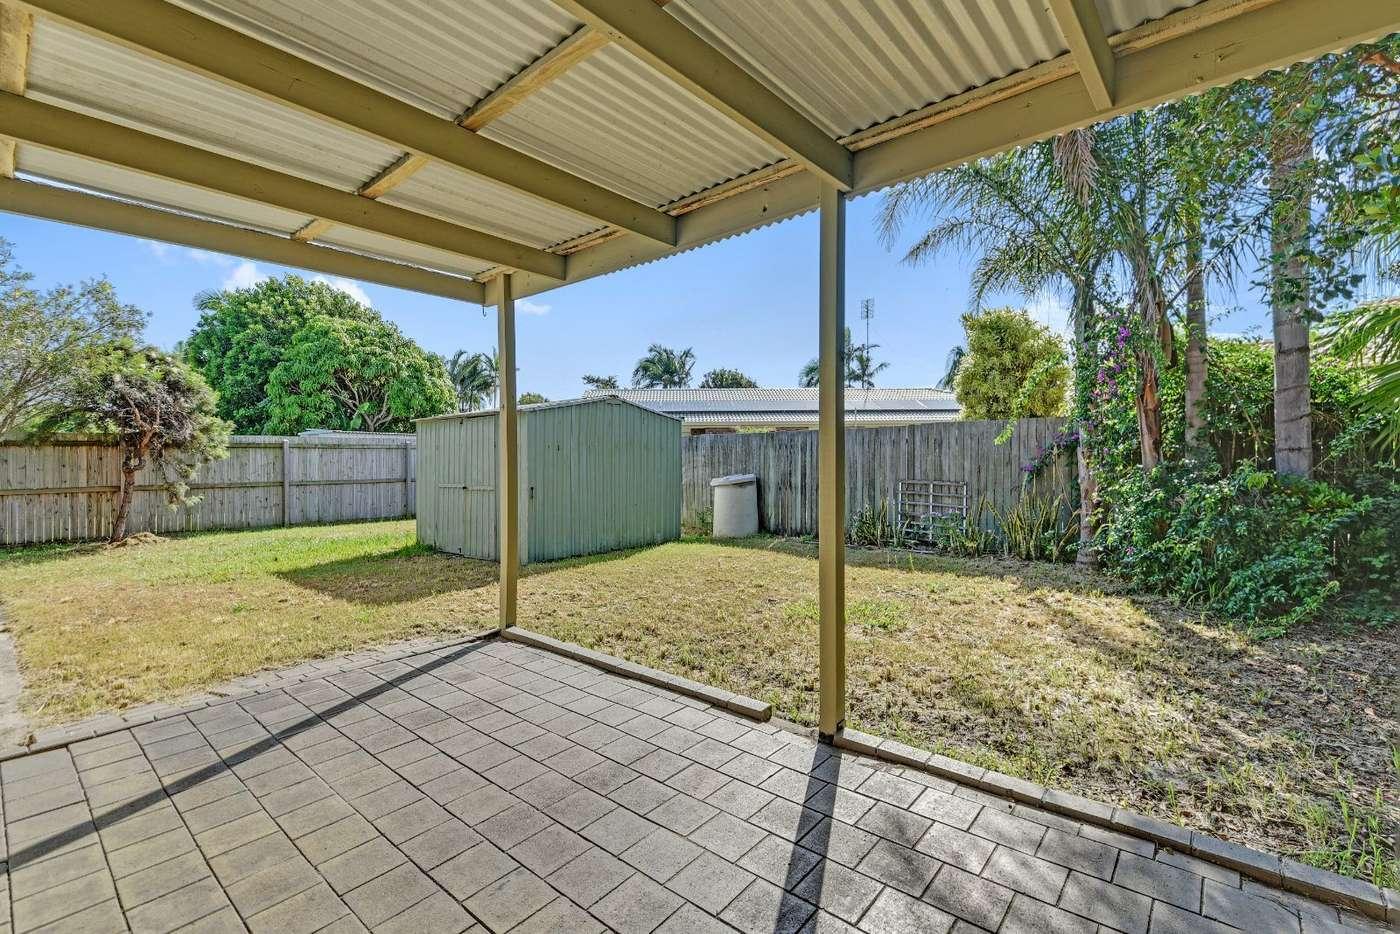 Main view of Homely house listing, 343 Nicklin Way, Bokarina QLD 4575